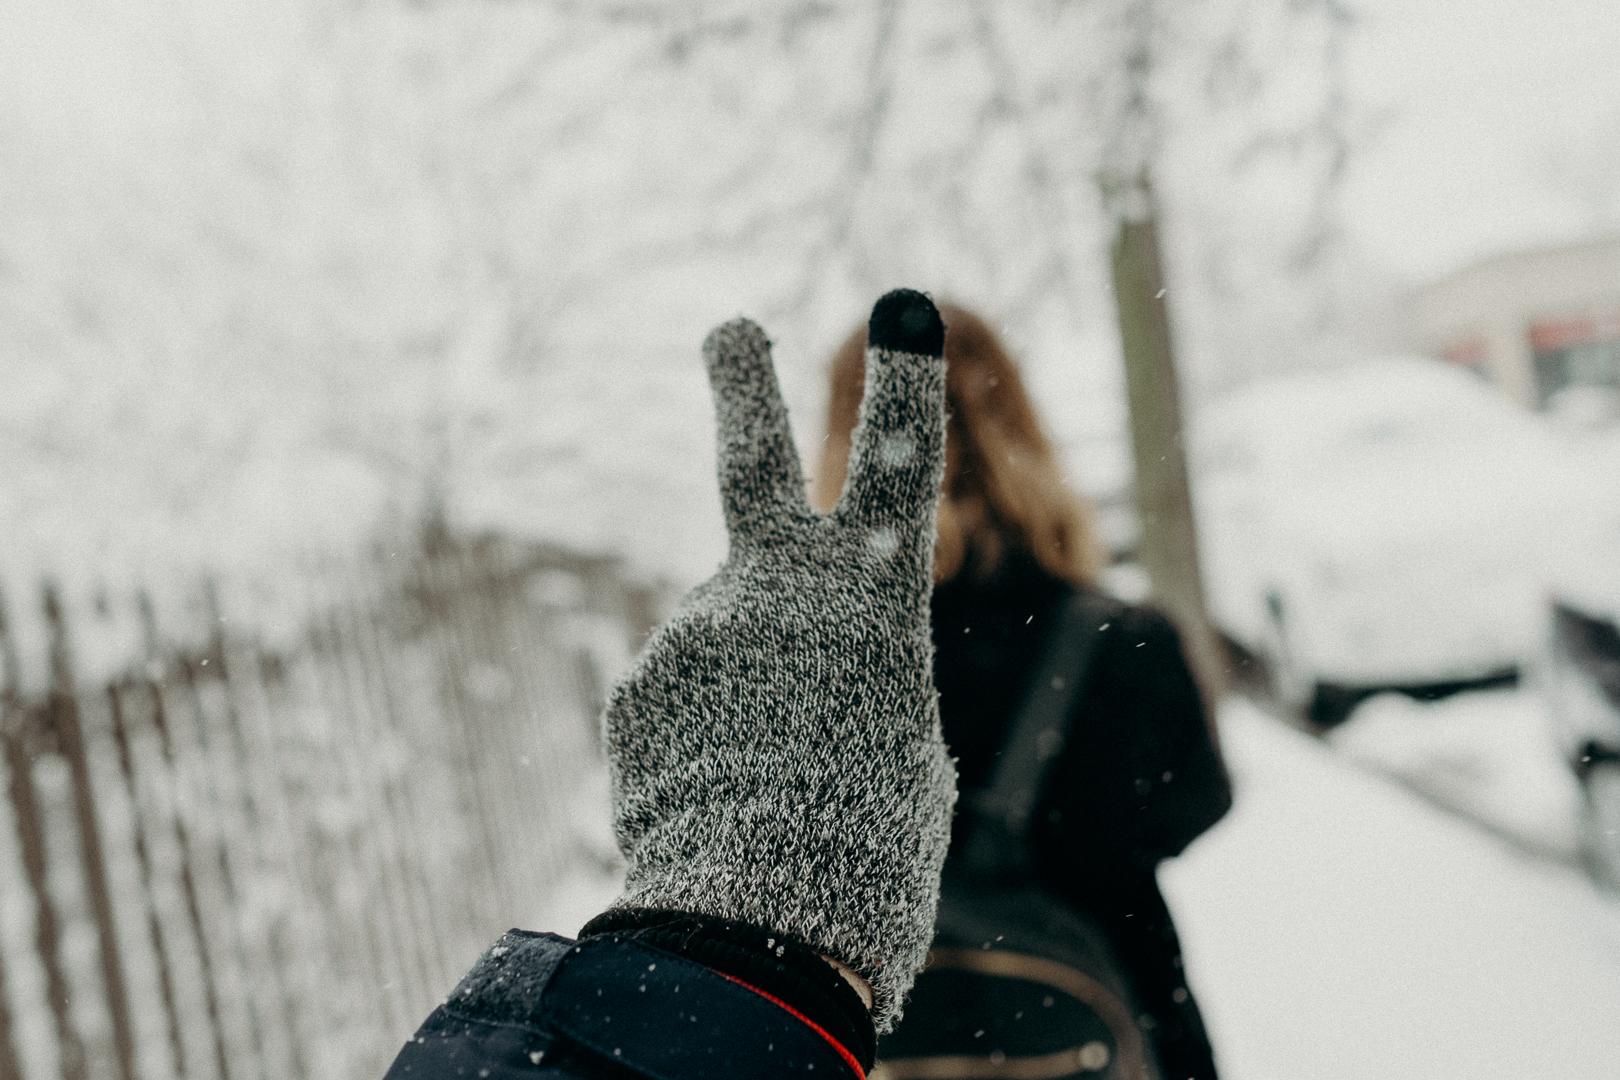 20190112_snowydaysin_kansascity_alihapperphoto_11.jpg